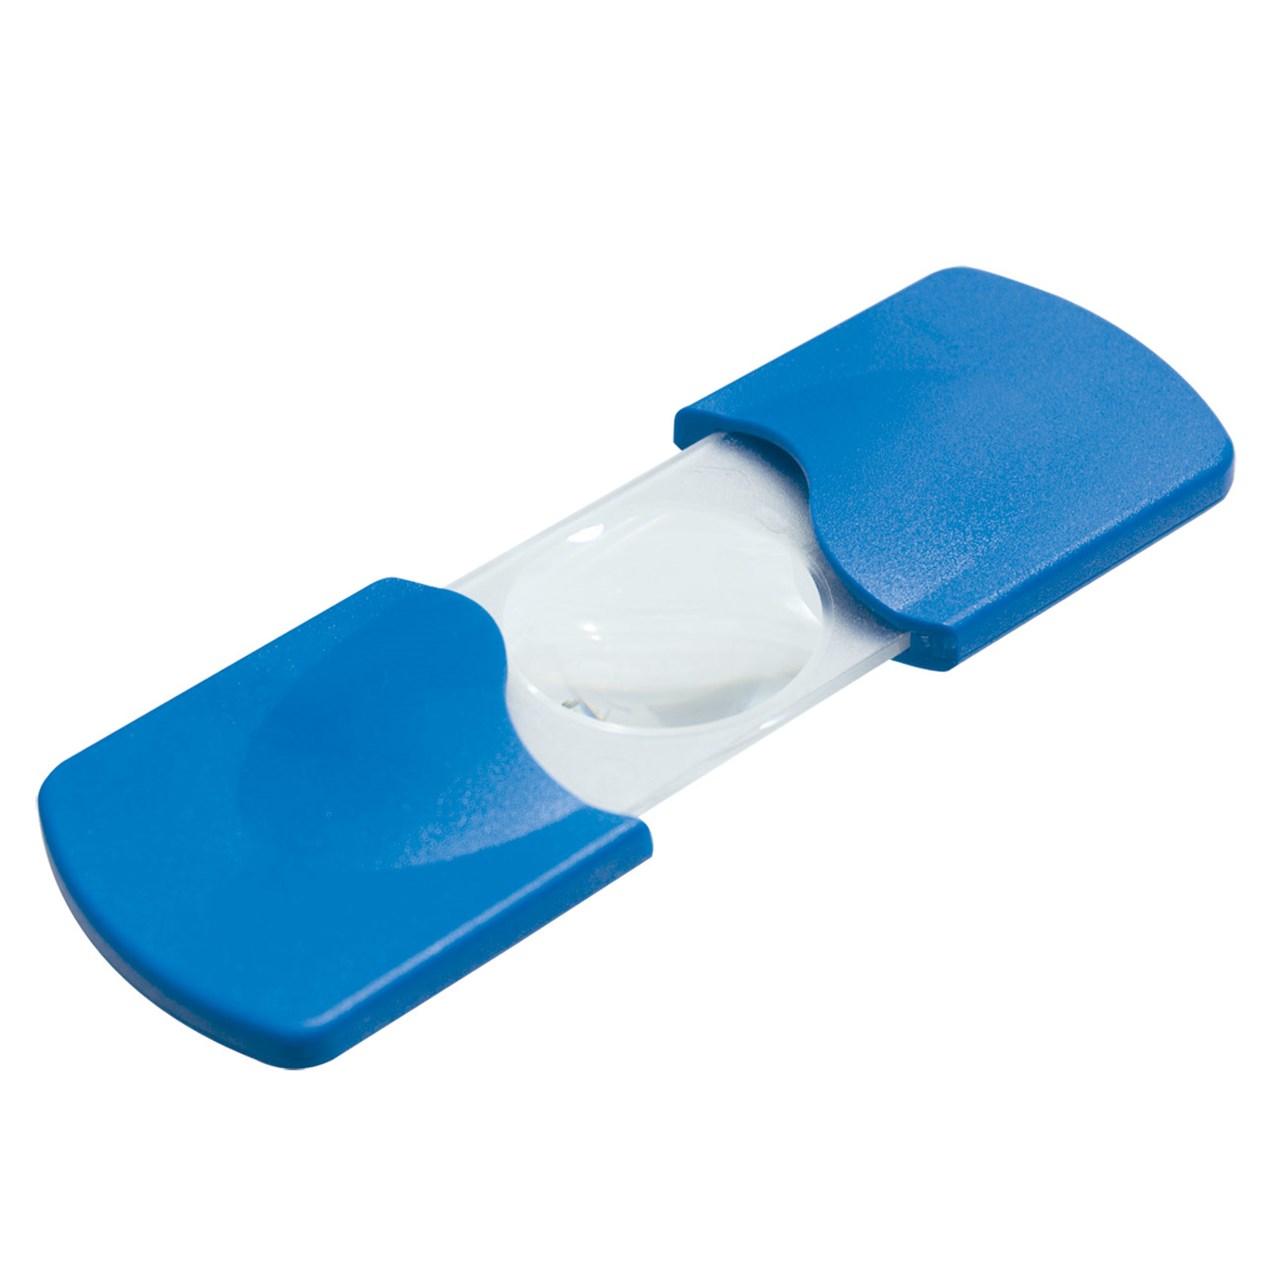 Coil 5x Sliding Pocket Magnifier